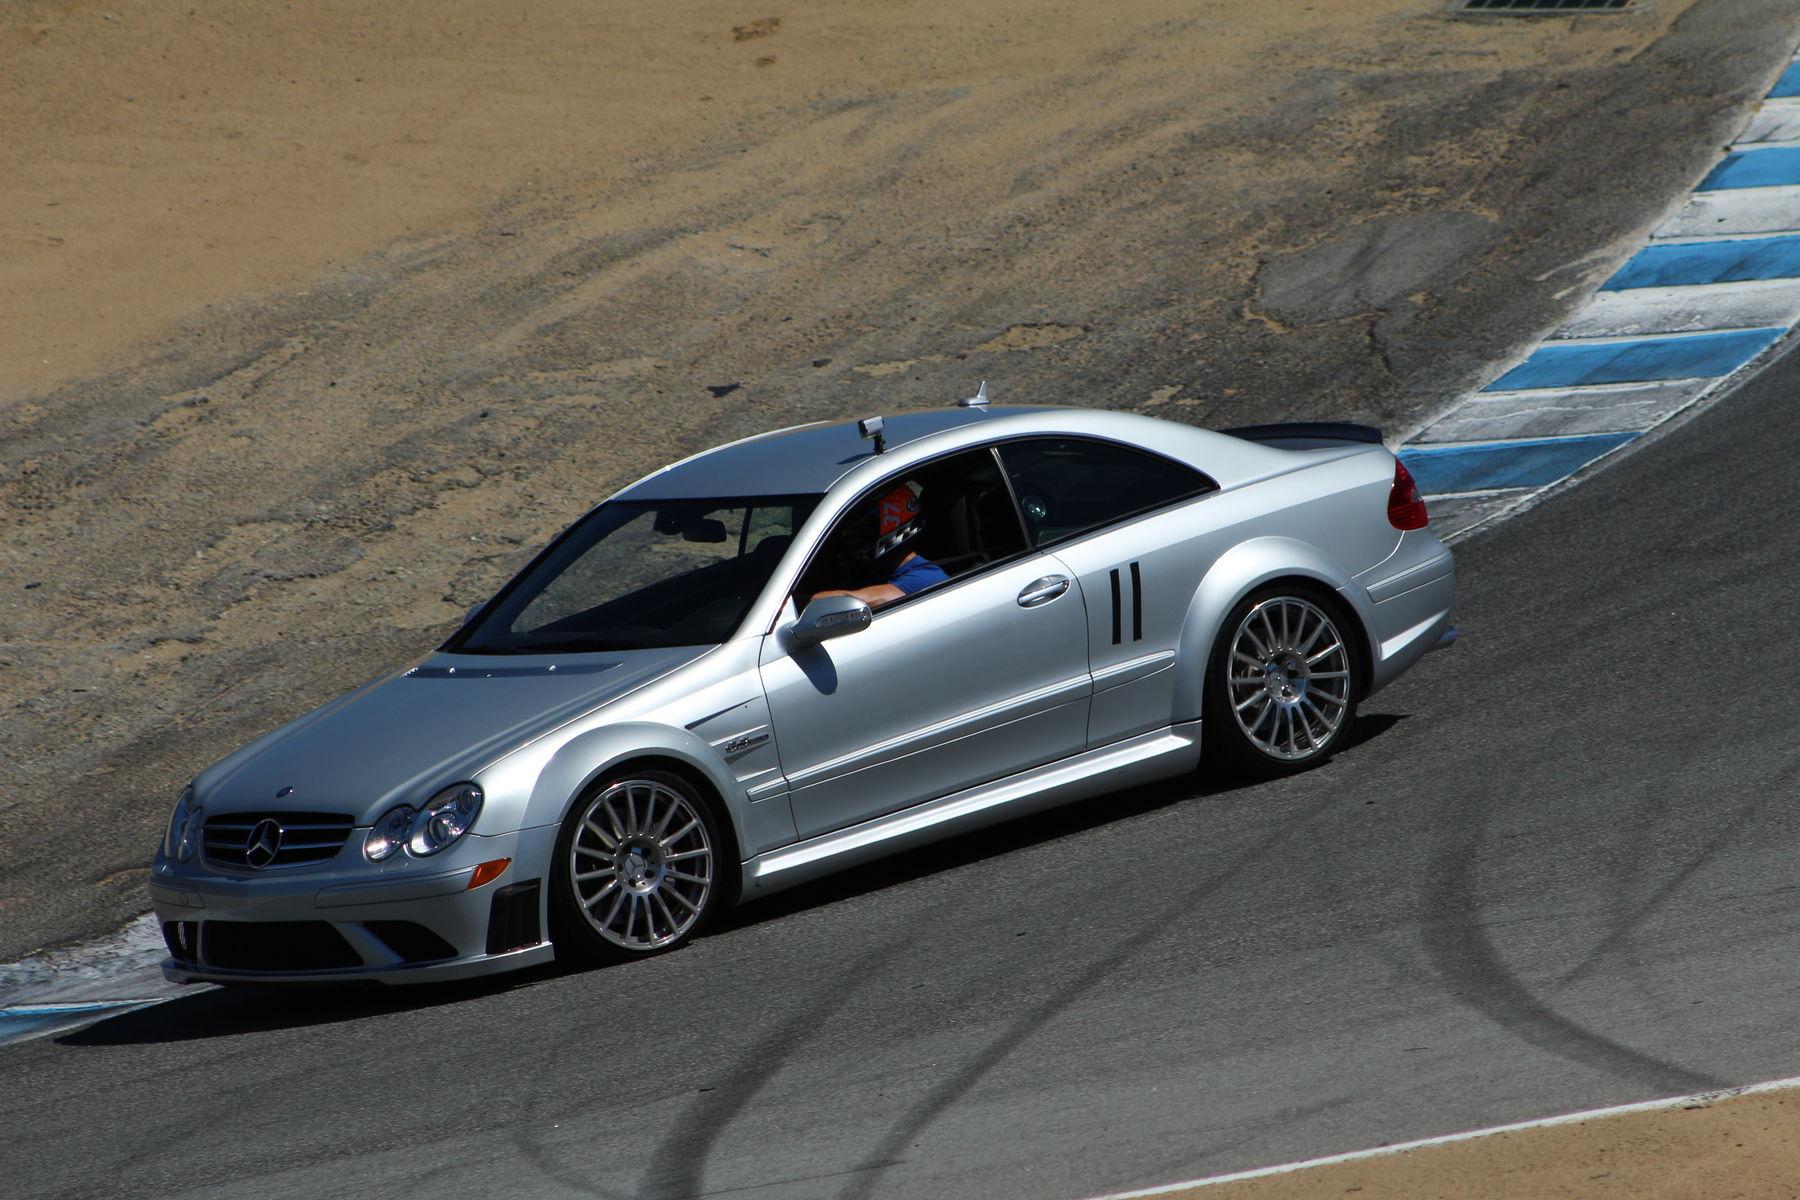 2008 Mercedes-Benz CLK-Class | CLK63 AMG Black Series